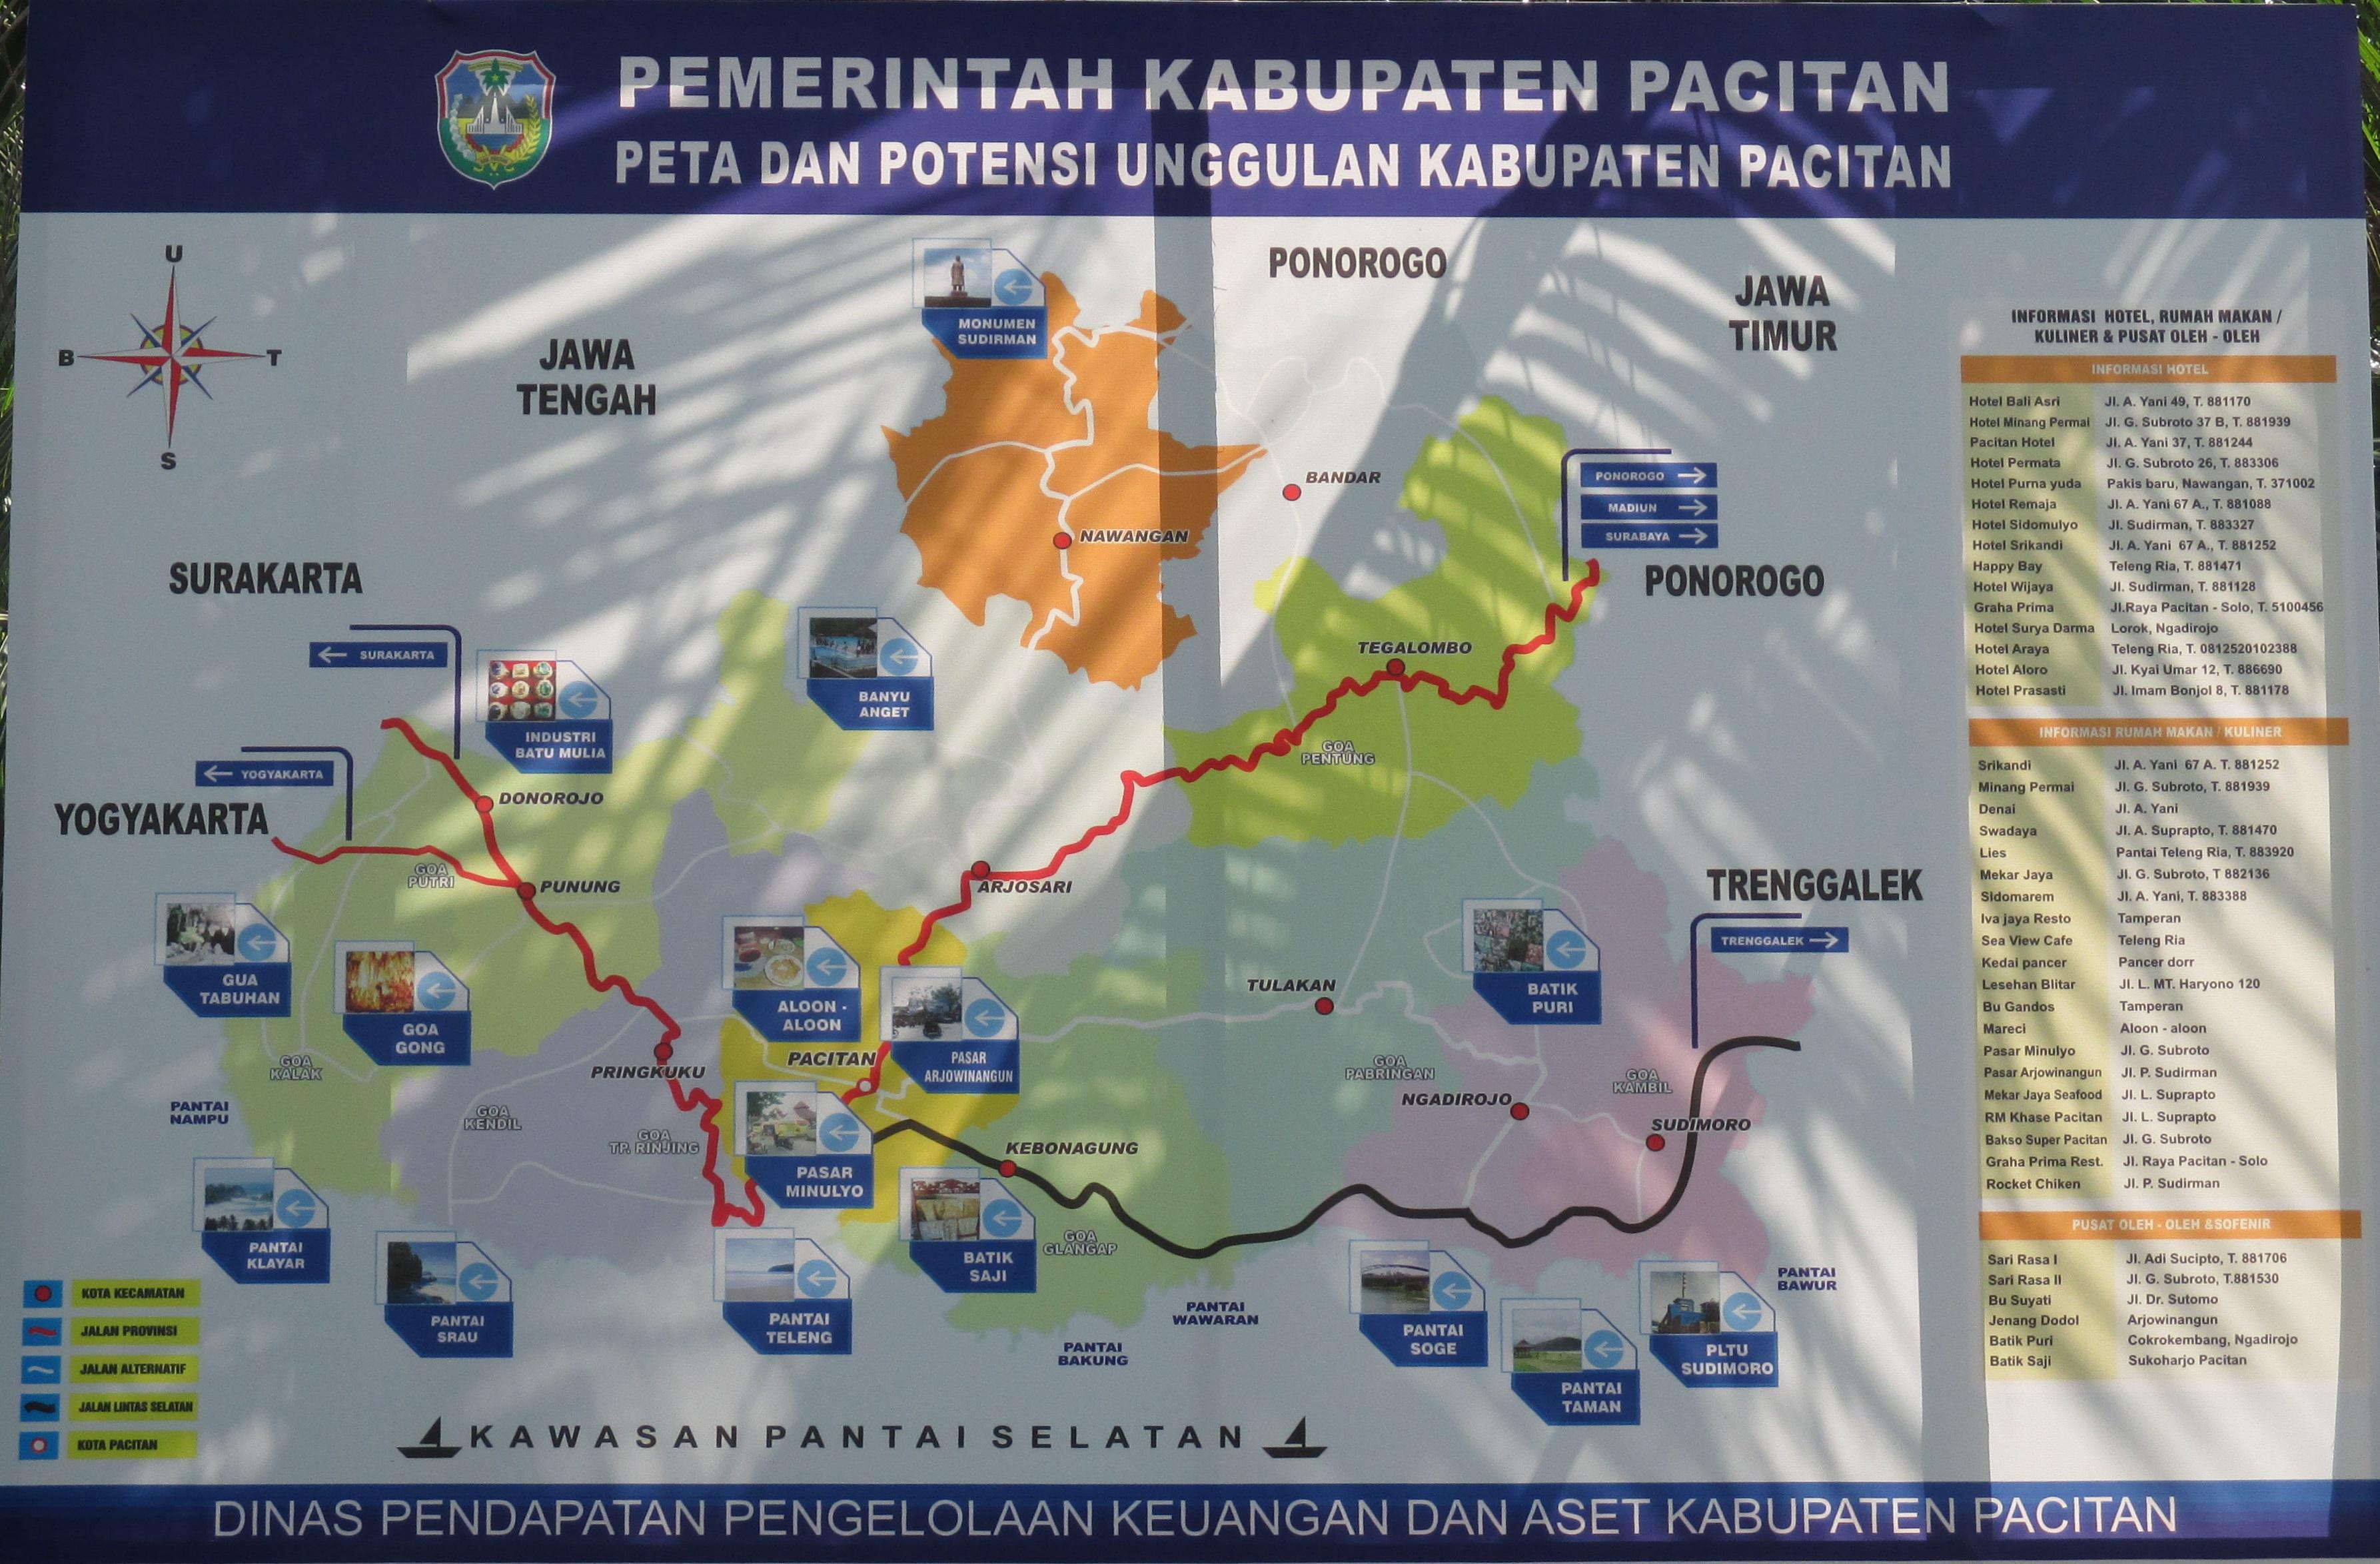 Mudik Pacitan Energi Dunia Poster 2014 Etalase Geopark Gunung Sewu